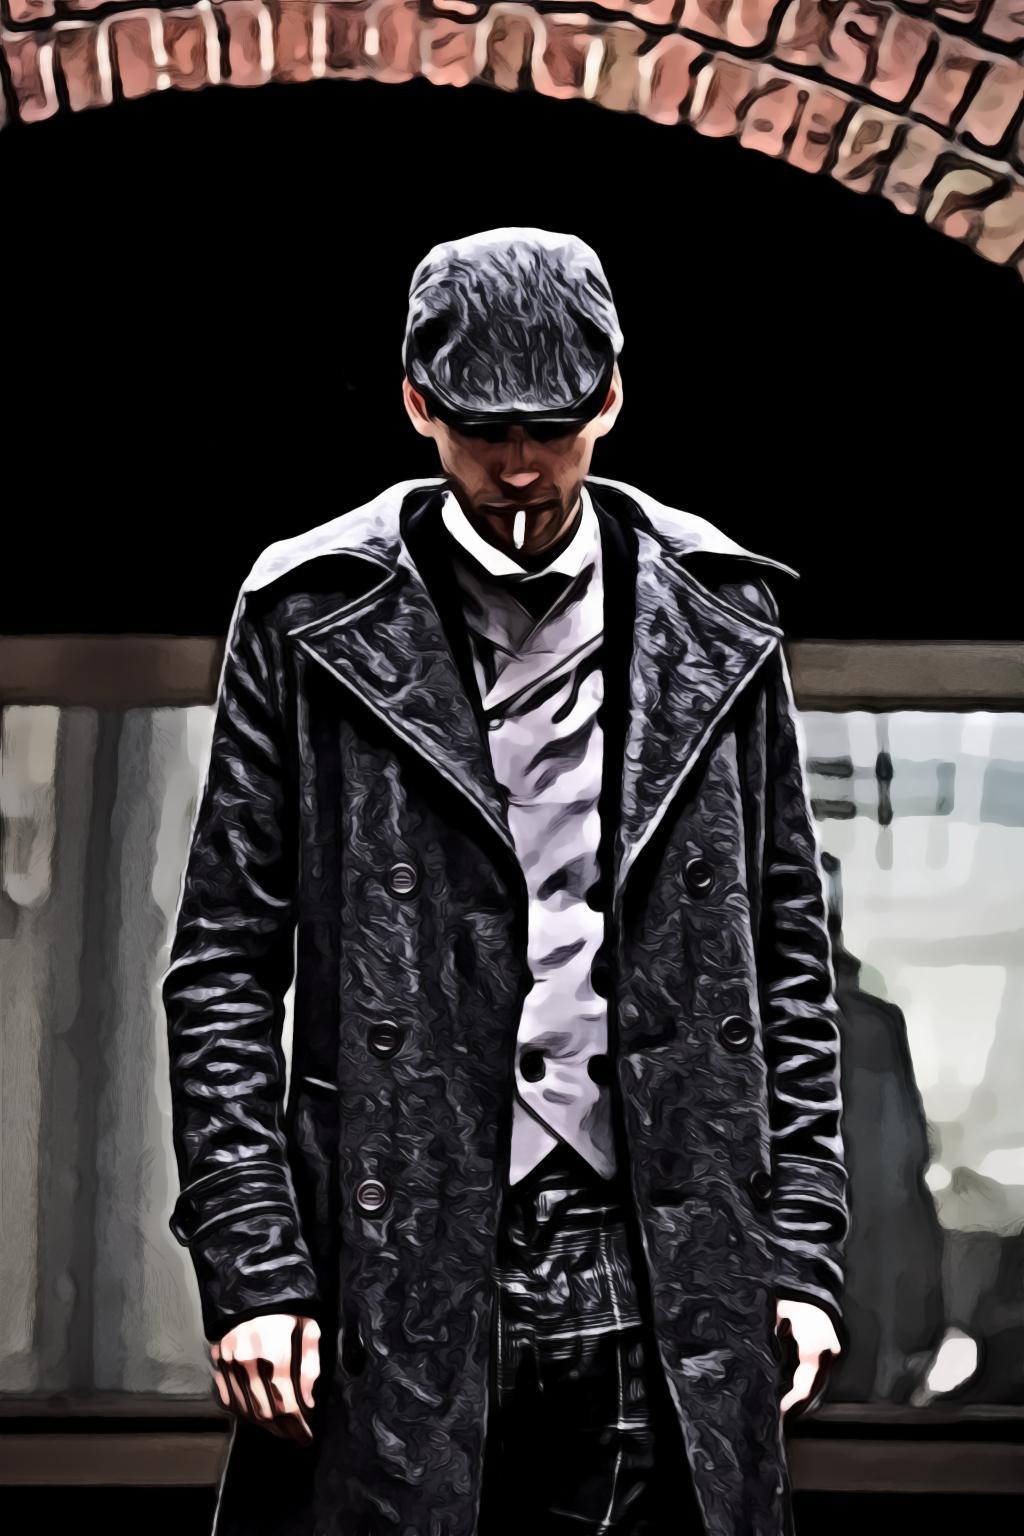 Man Wearing Gray Coat